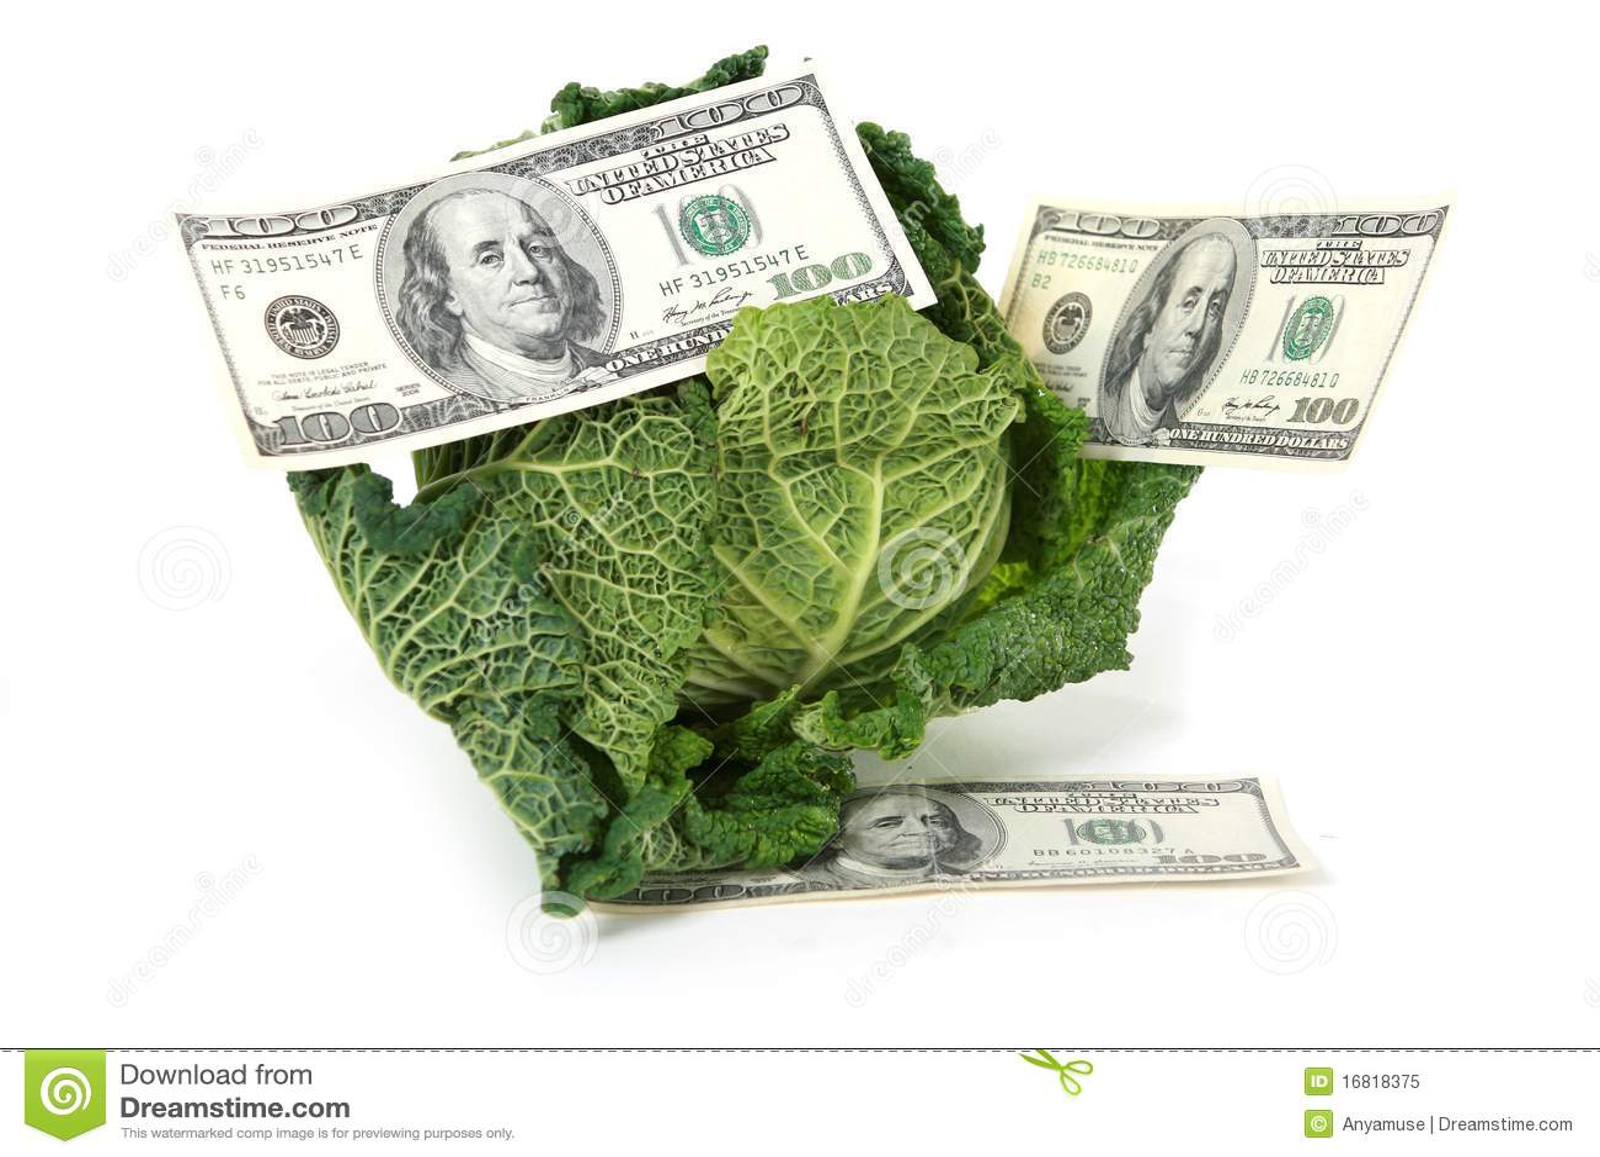 онлайн займы на банковскую капуста